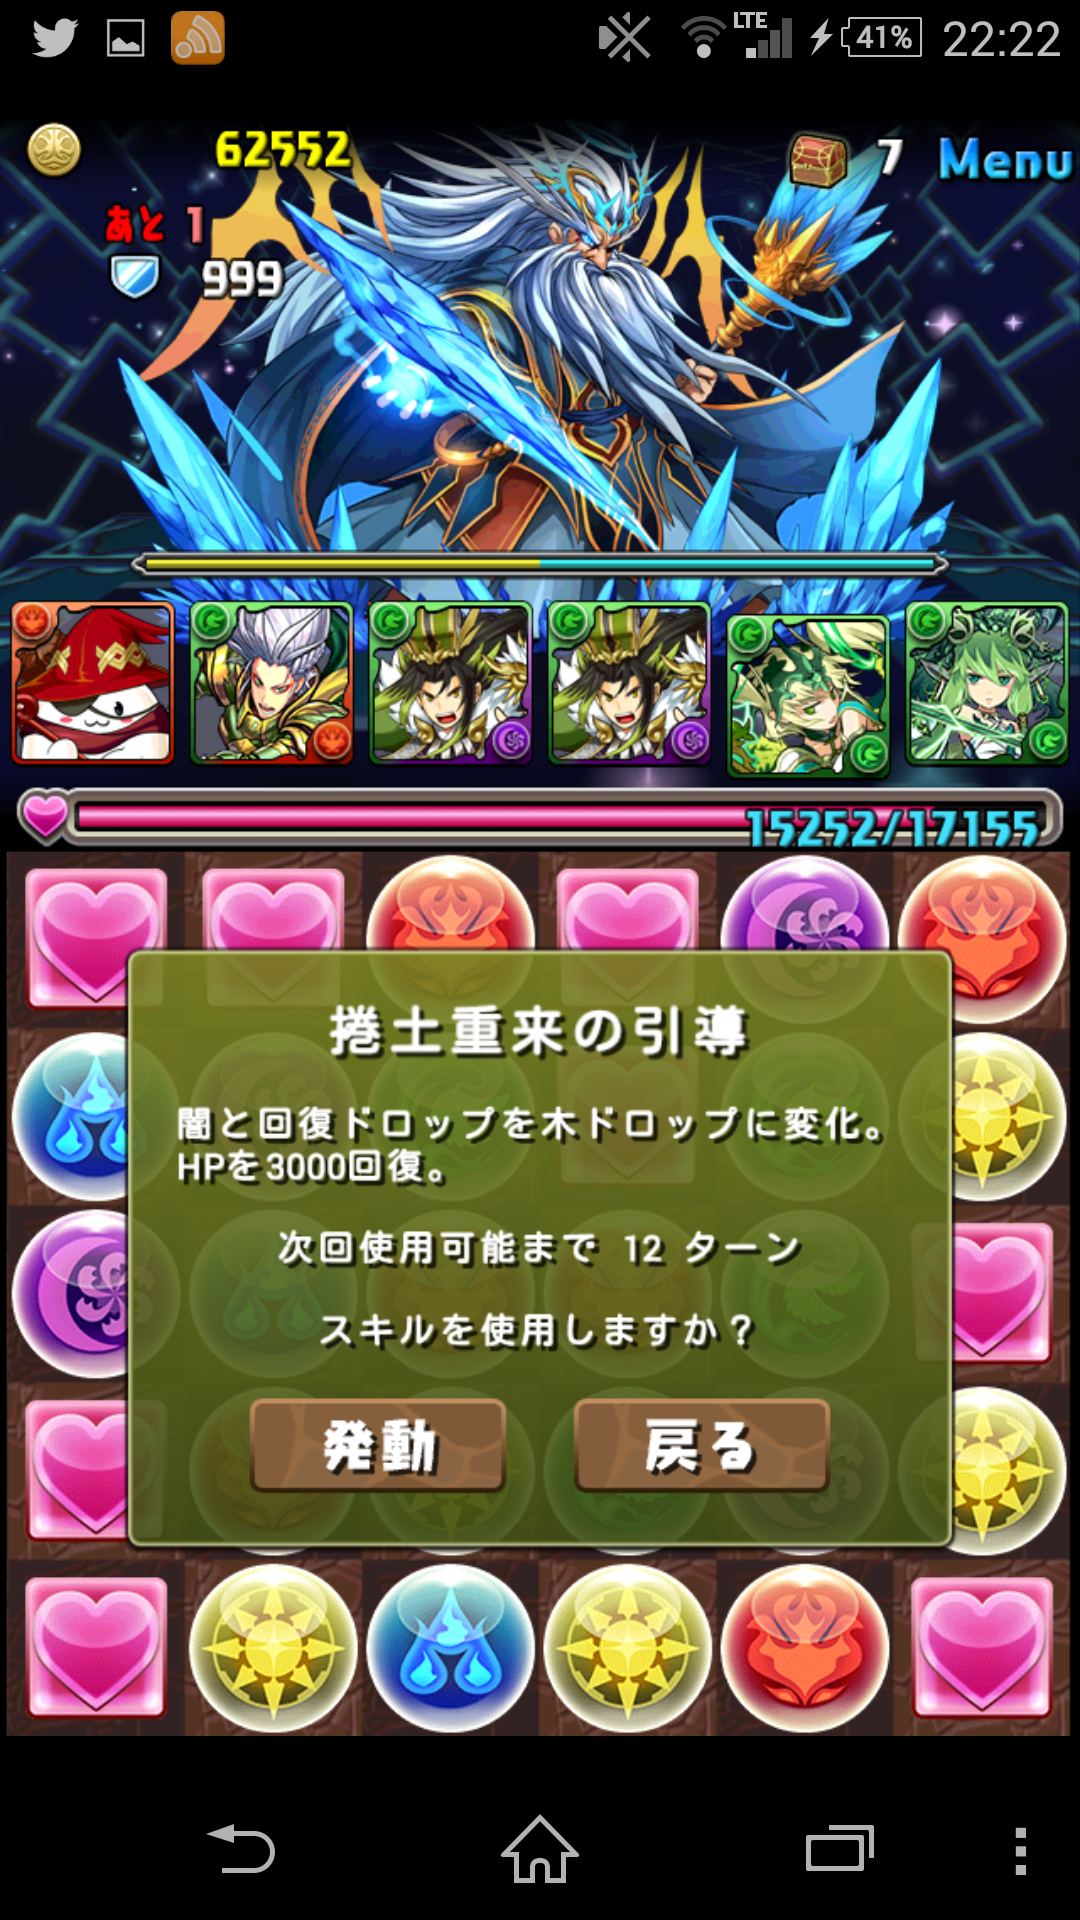 Screenshot_2015-02-20-22-22-26.png